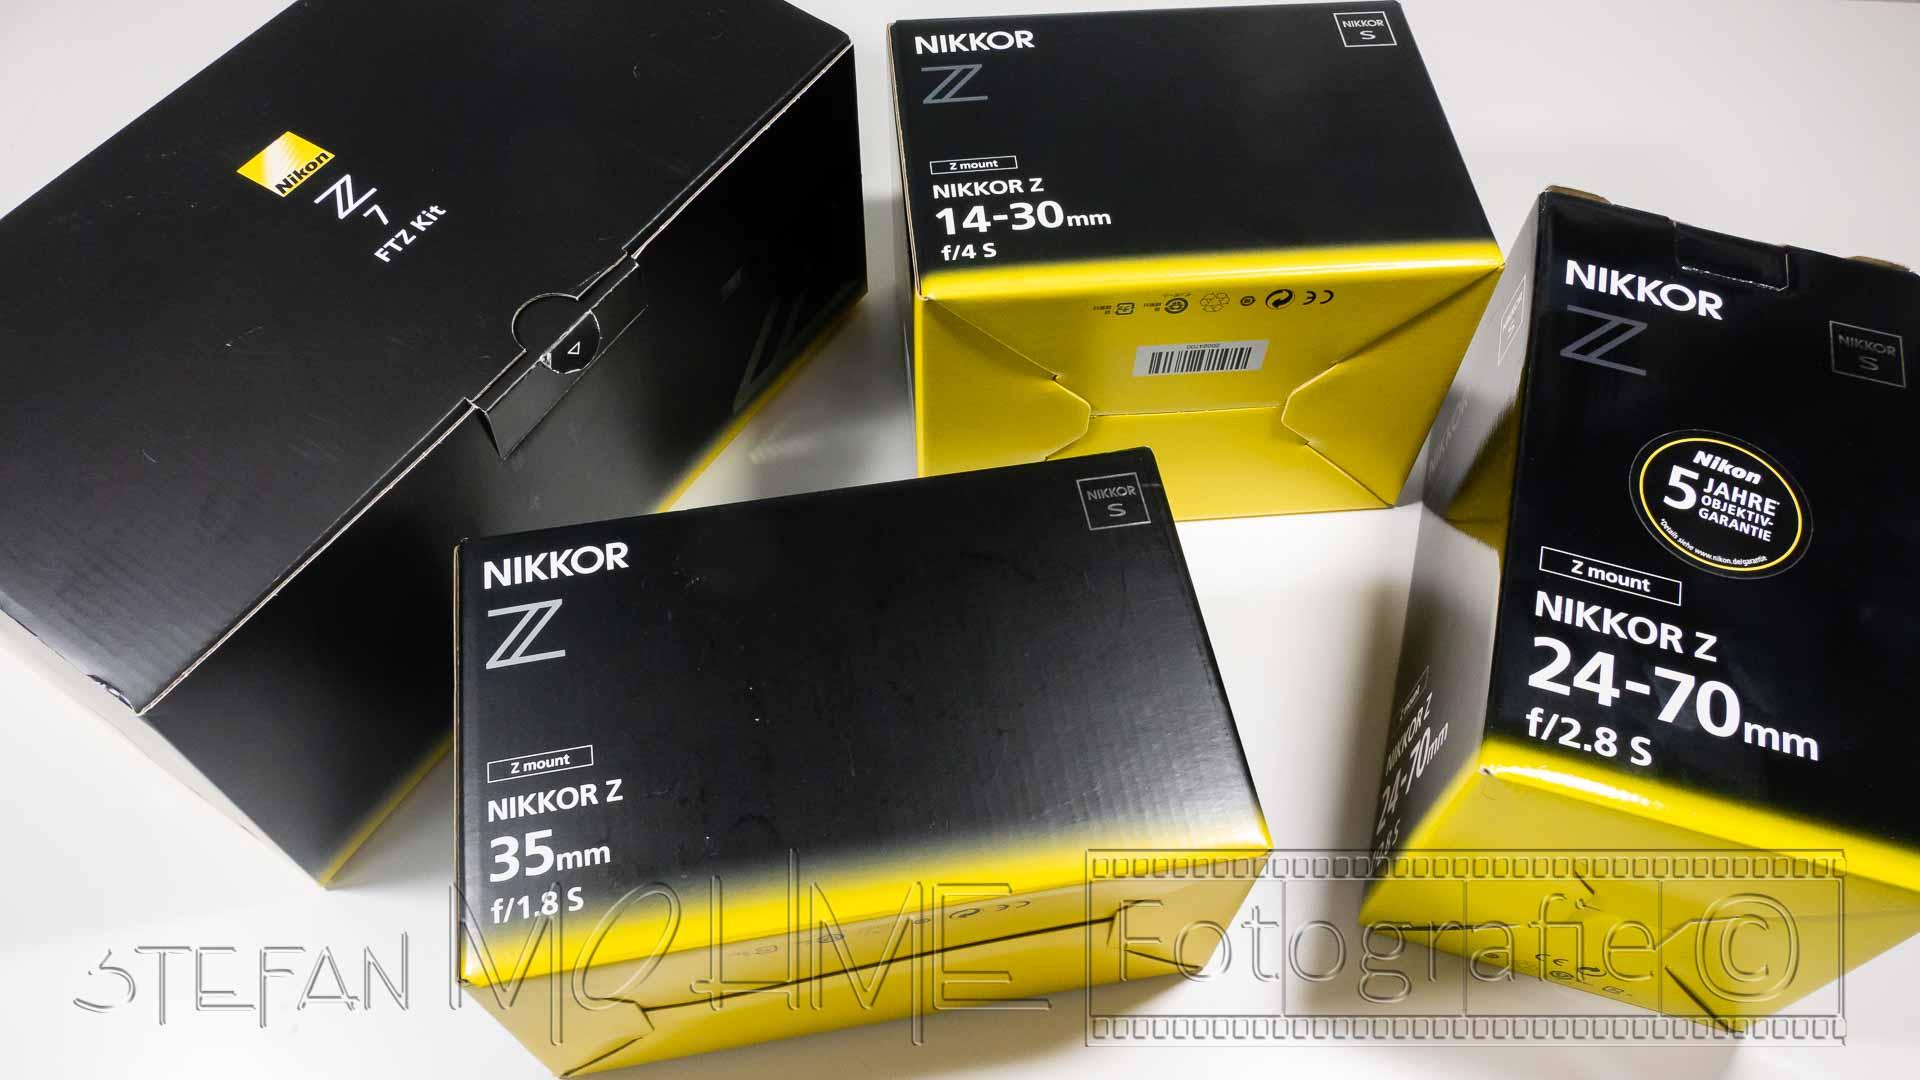 Nikon z7 sinnvolles Zubehör